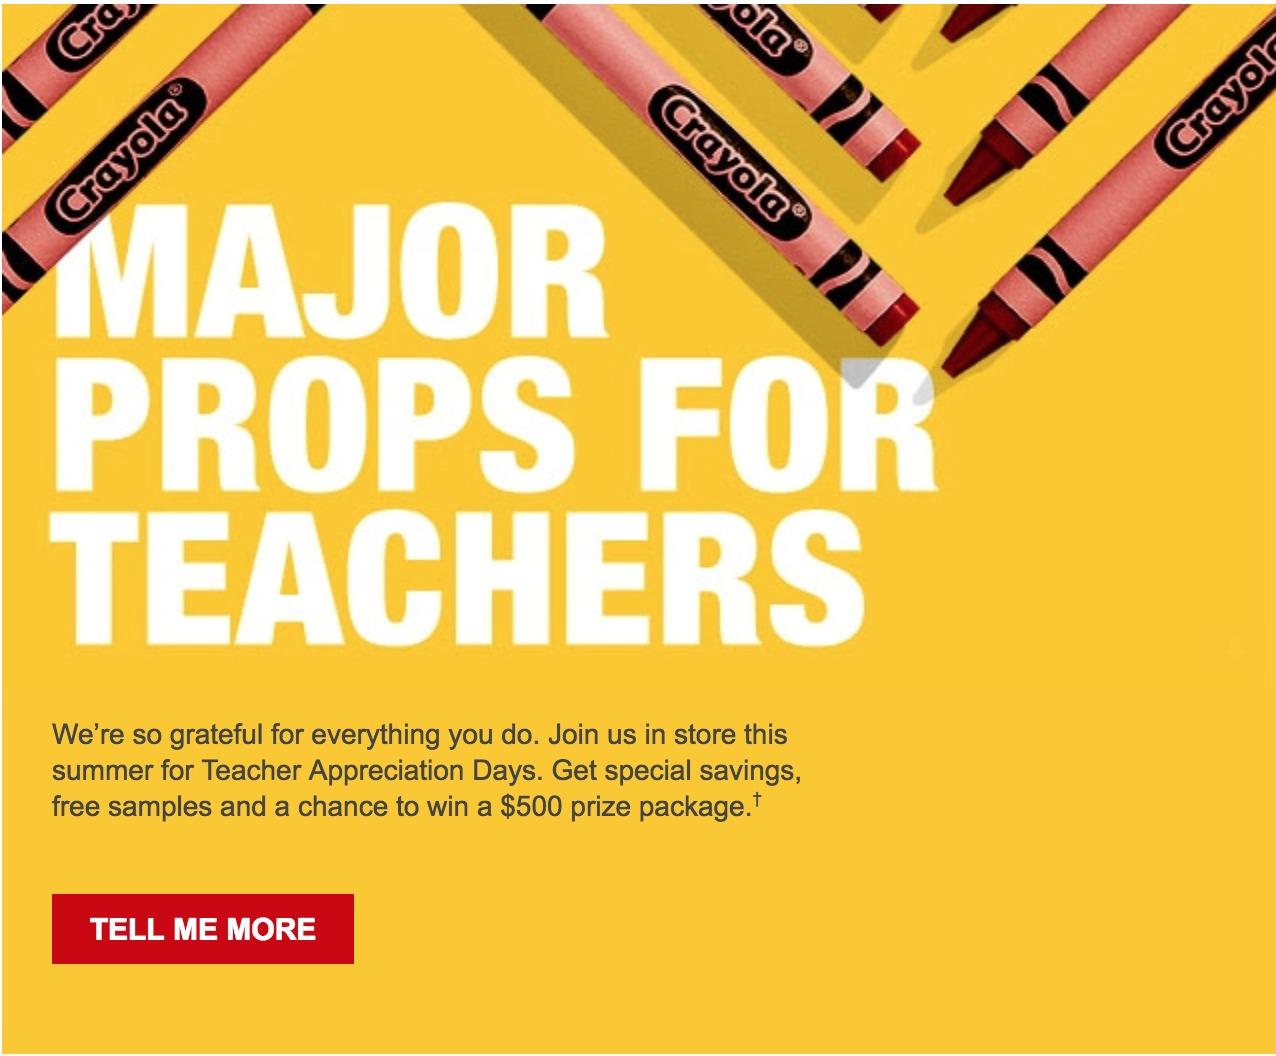 Staples teacher discount